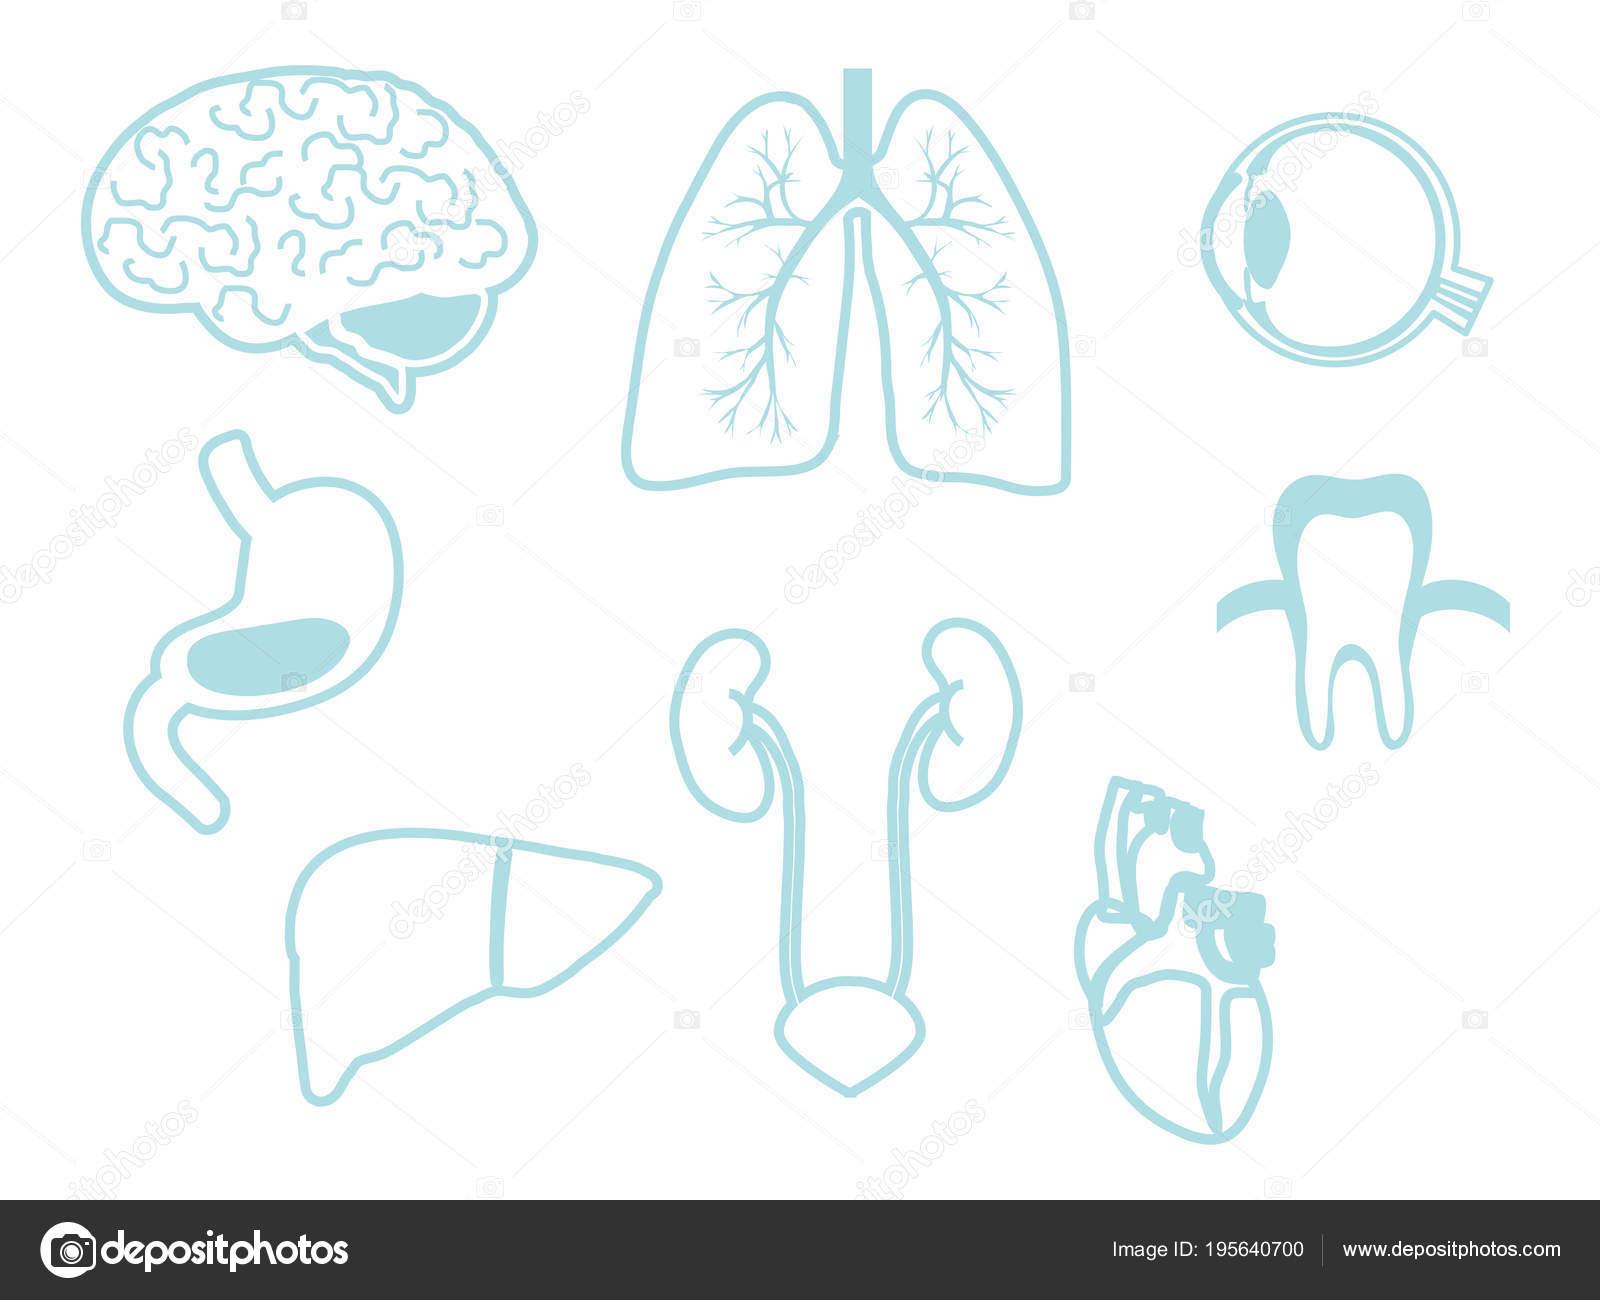 Collection internal organs man stock vector alinalil collection internal organs man stock vector ccuart Images